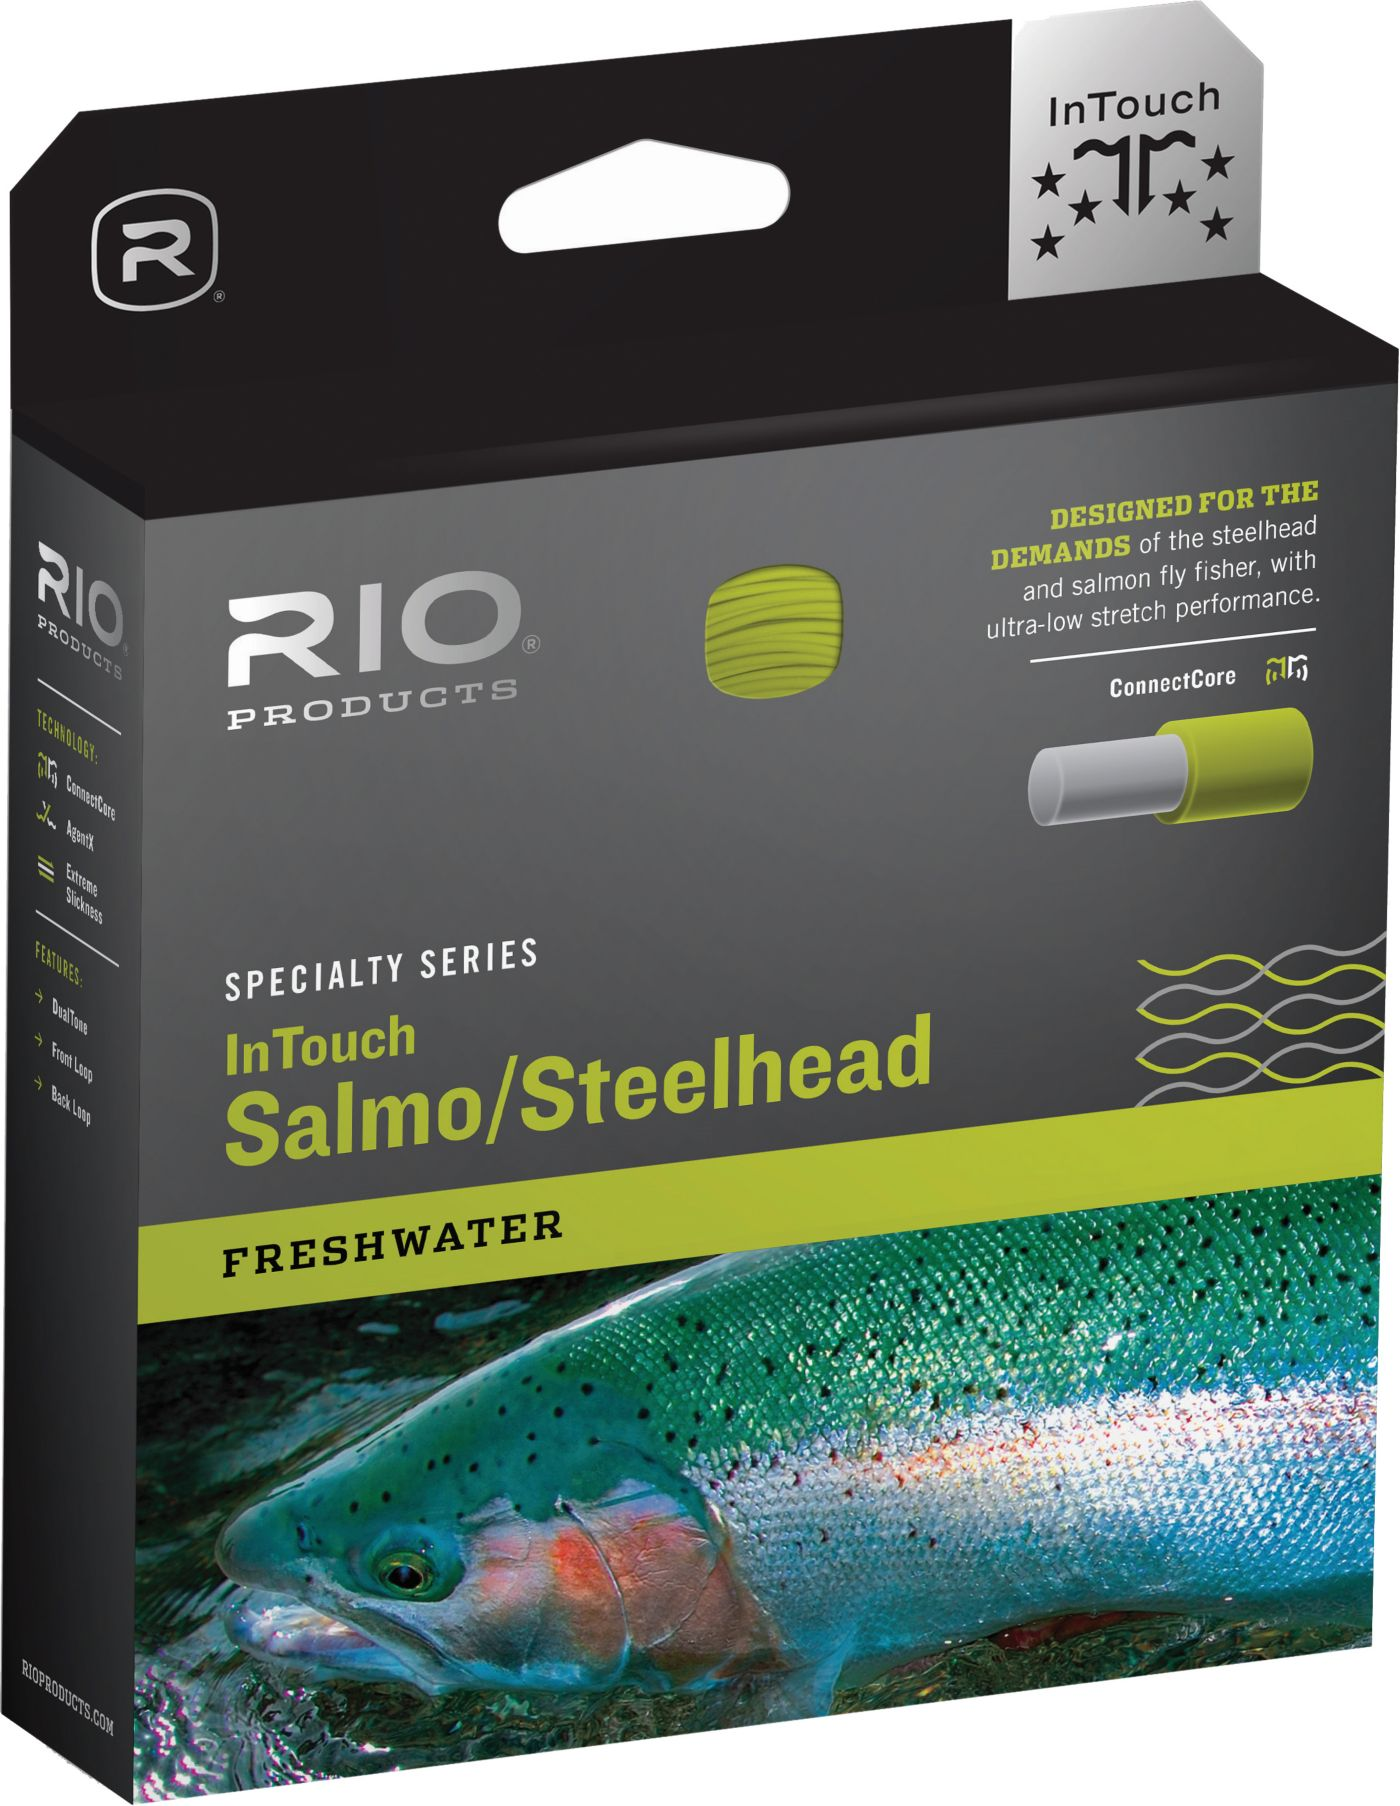 RIO InTouch Salmon/Steelhead Freshwater Fly Line